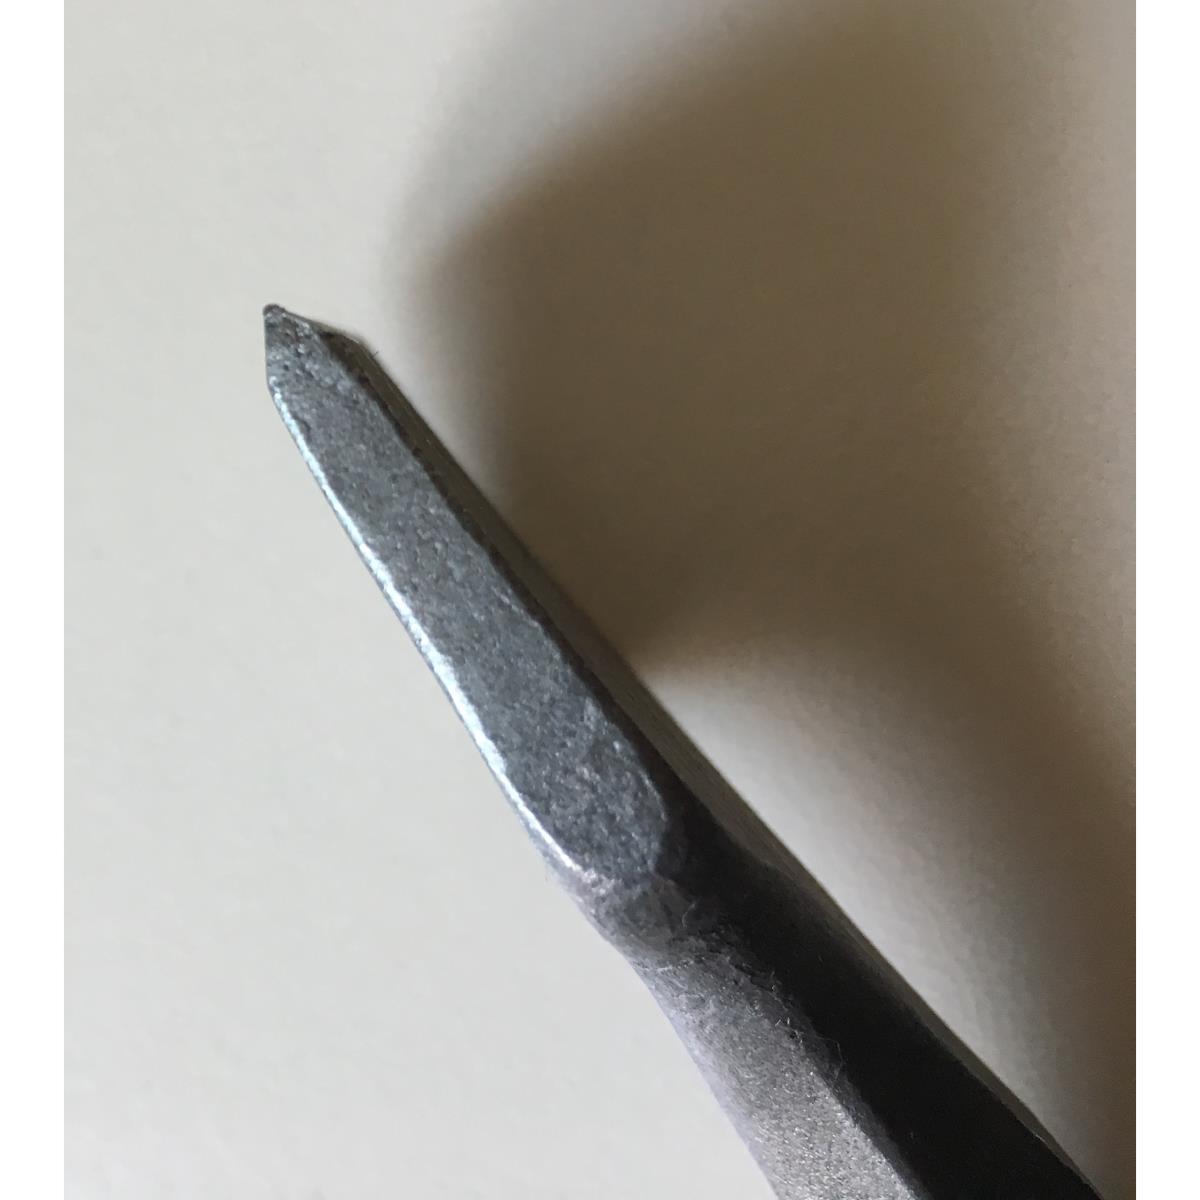 SDS Plus Flachmeissel Breitmeißel 40 breit x 250 mm lang Fliesenmeißel Meißel,Vagner SDH,000051055535, 2000510555357